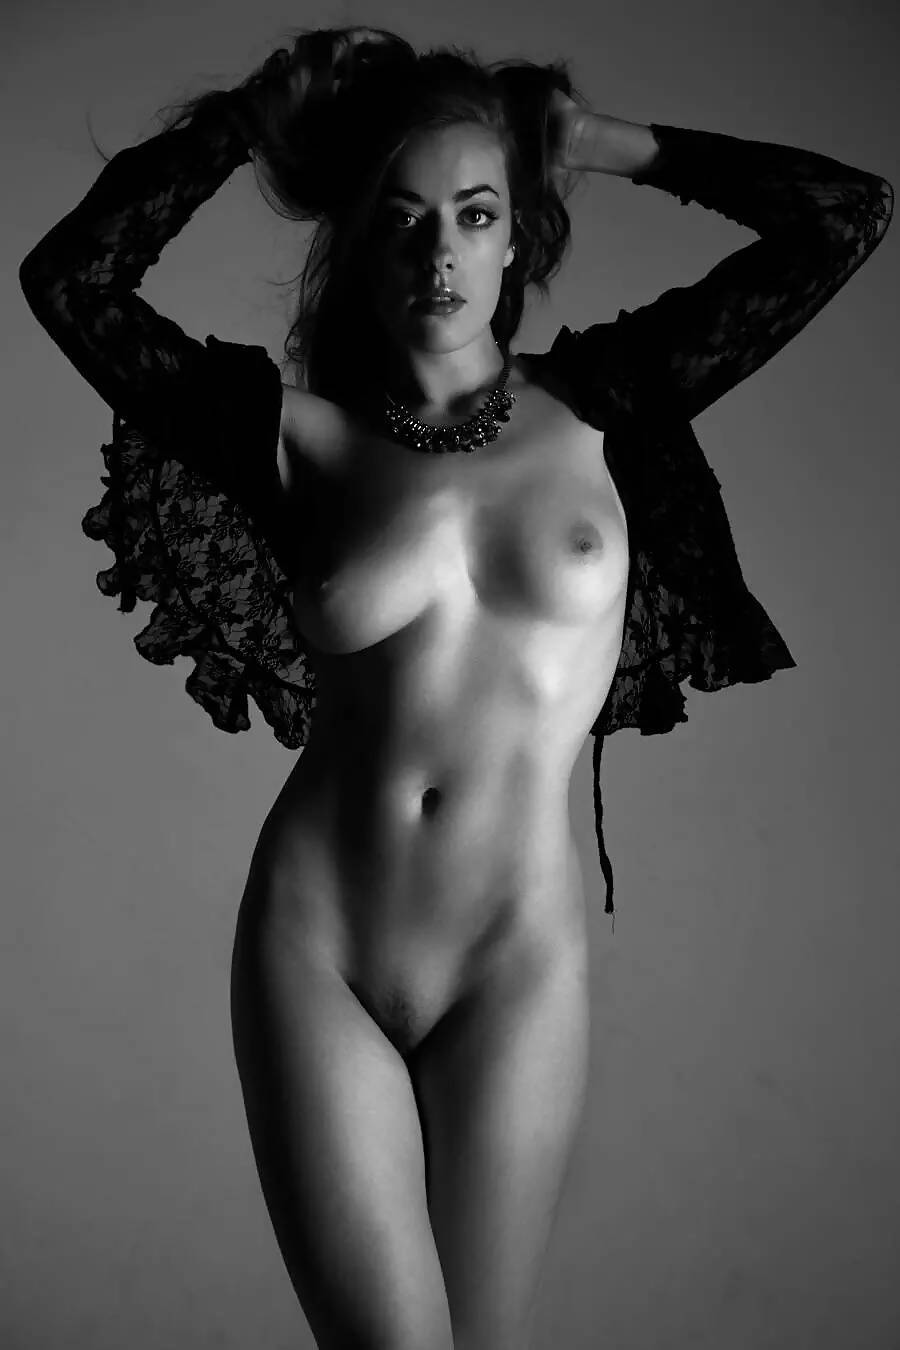 https://fitnakedgirls.com/wp-content/uploads/2020/03/FitNakedGirls.com-Rosa-Brighid-nude-19.jpg